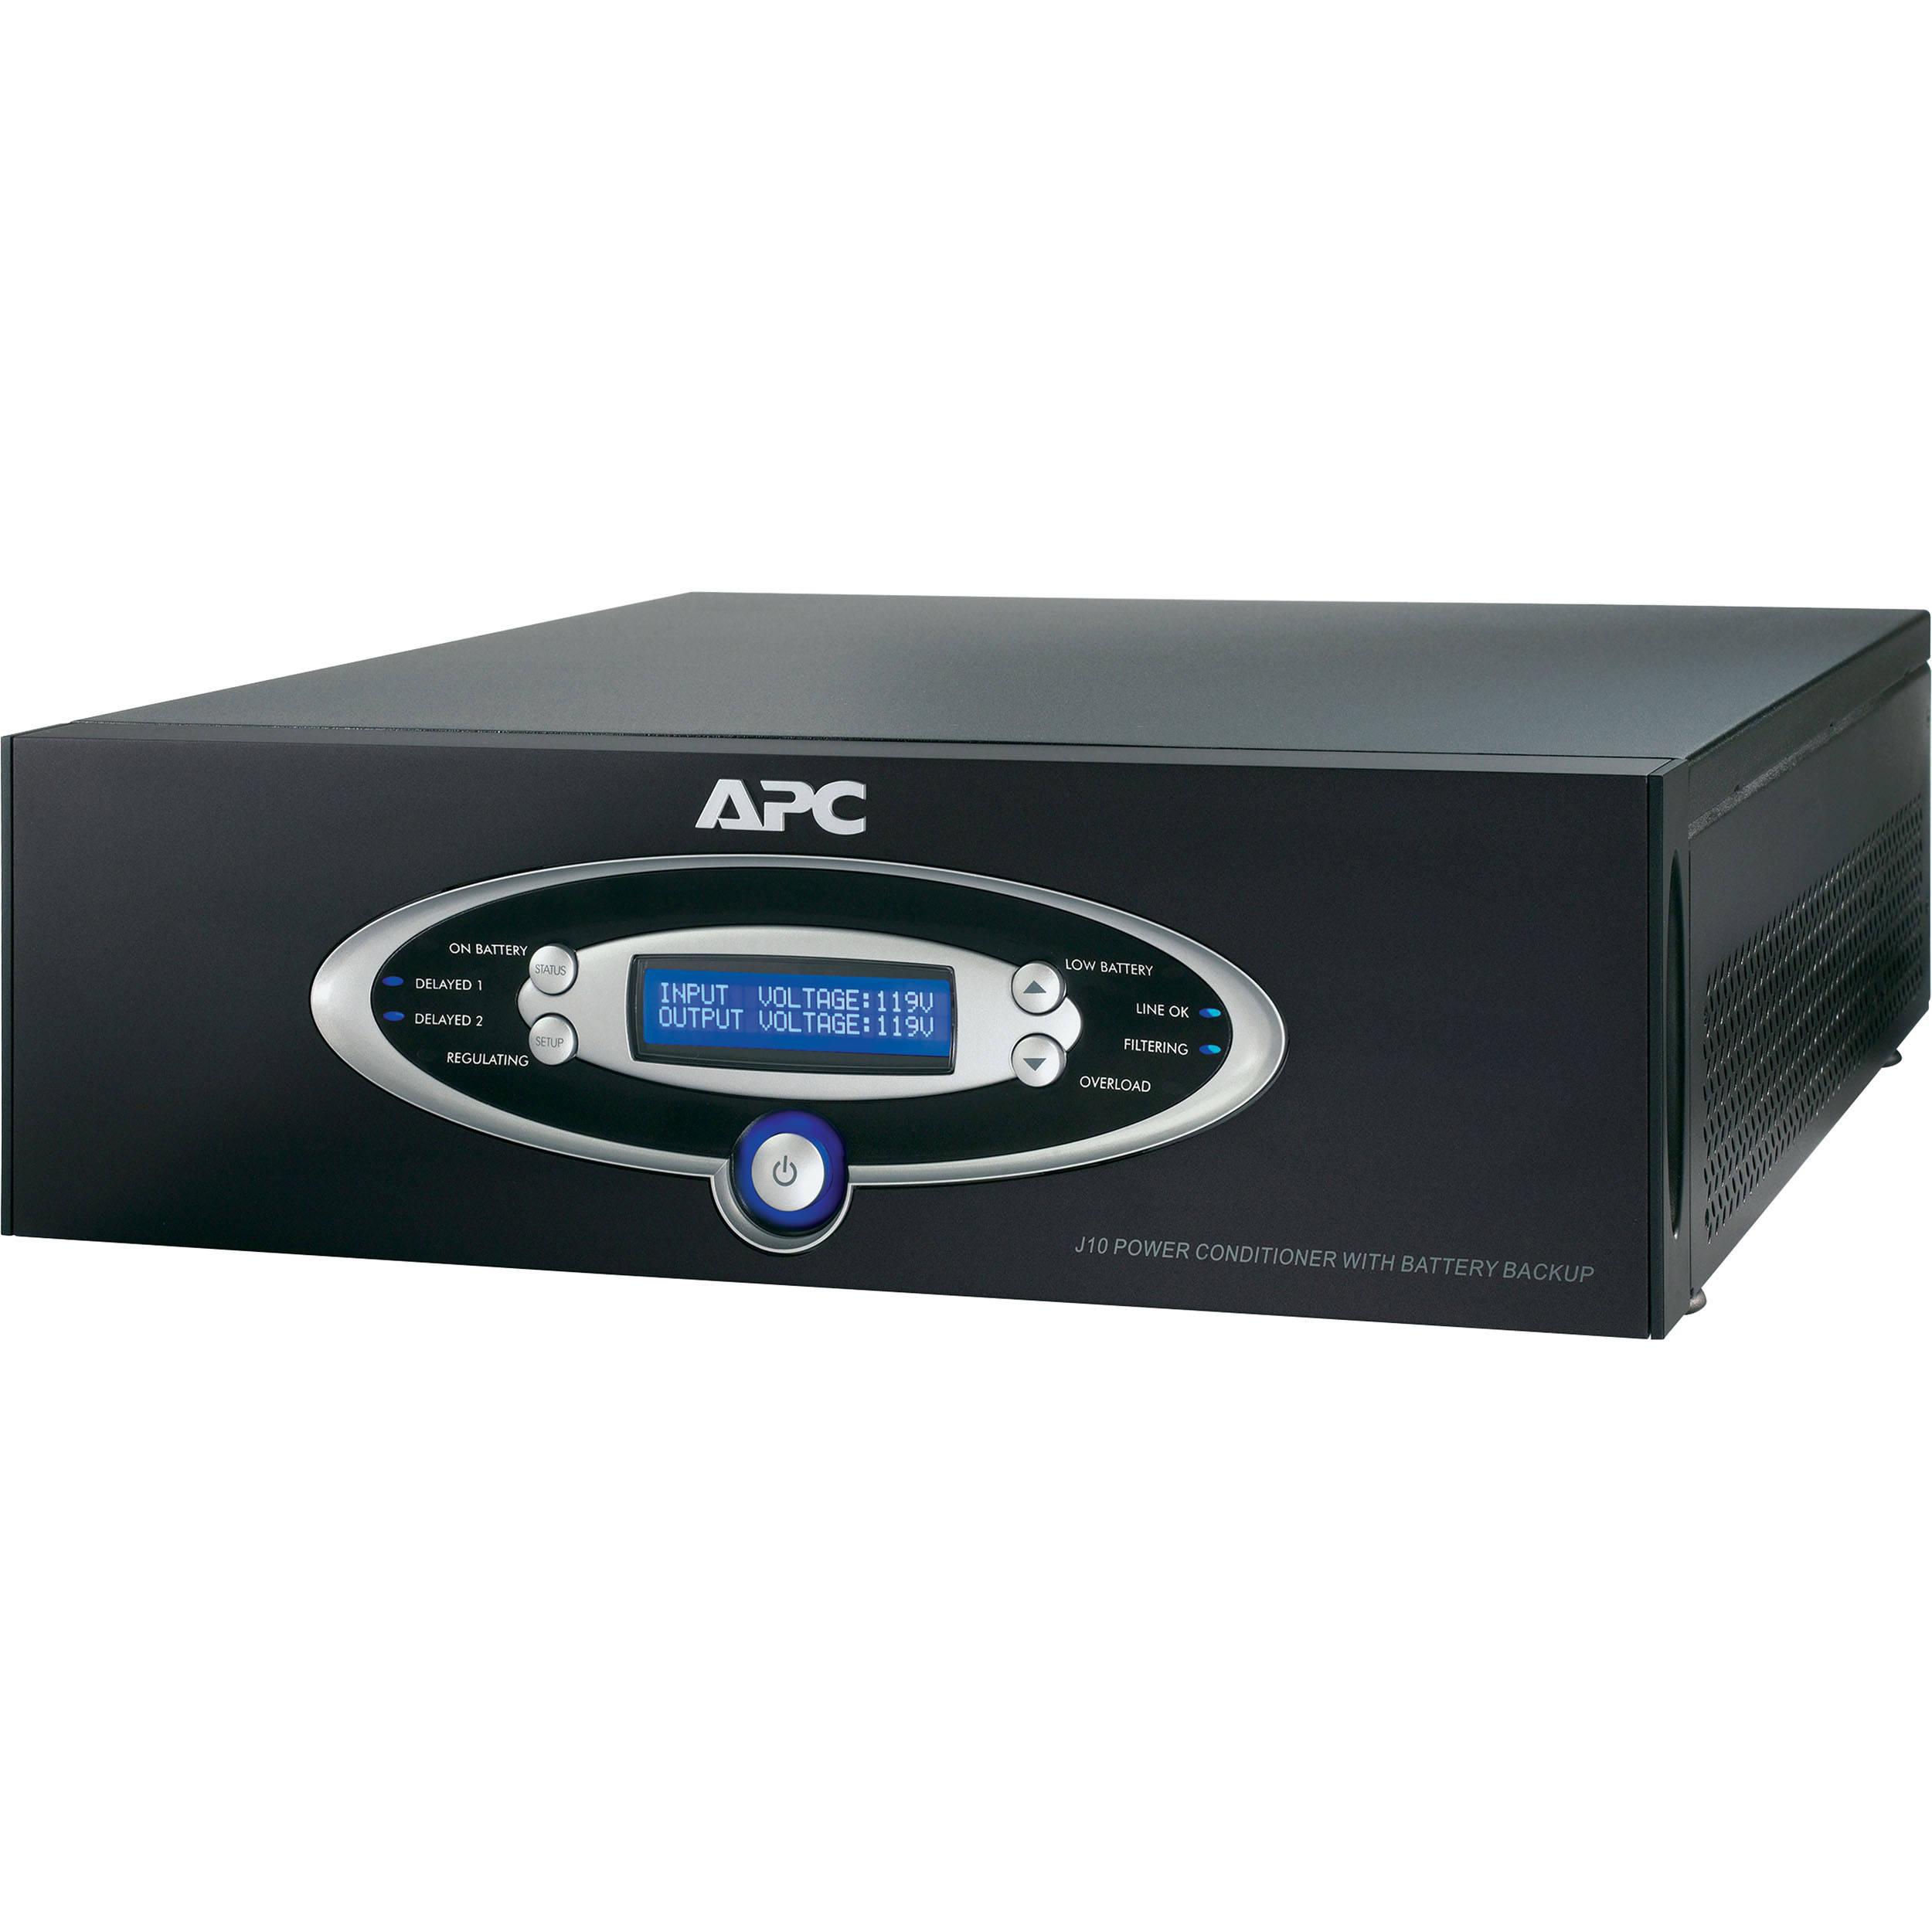 Apc J15 Home Theater Conditioner Battery Backup Black